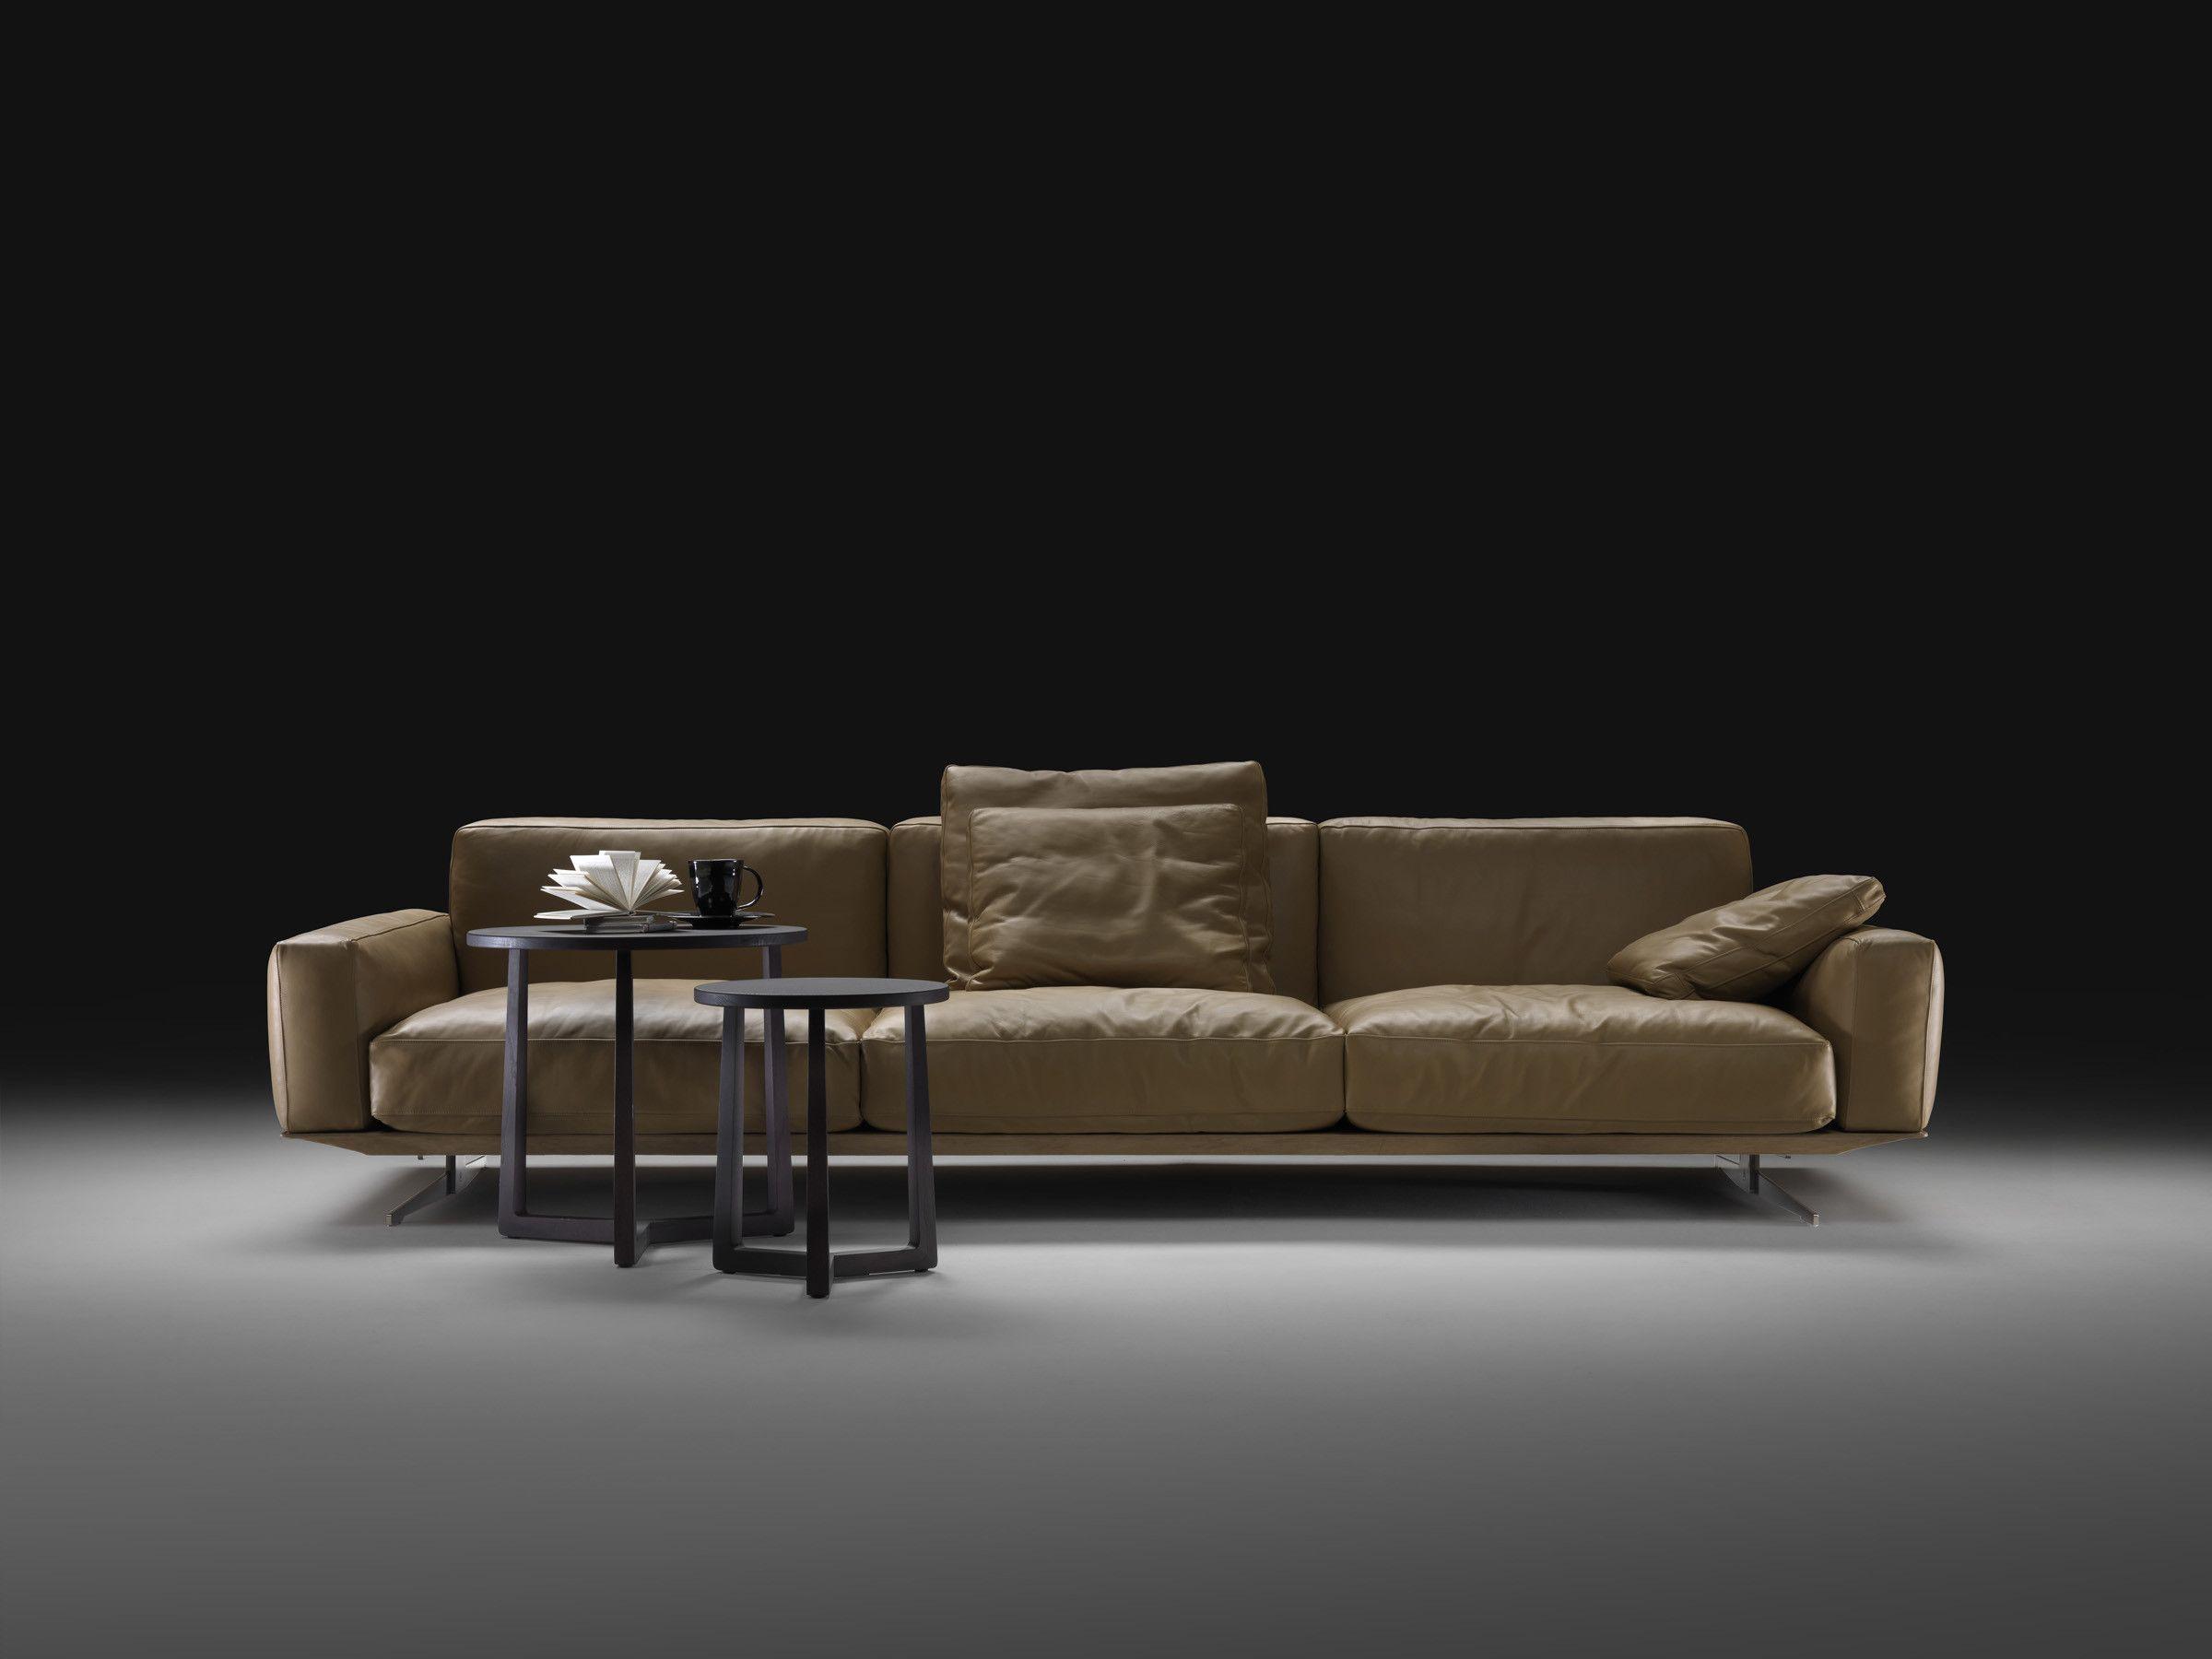 100 Furniture Warehouse In Eastlake Catches On Hold  : b8cd08e0a9634f0c3566bbf6e832e008 from ubytovani-melnik.com size 2400 x 1800 jpeg 206kB